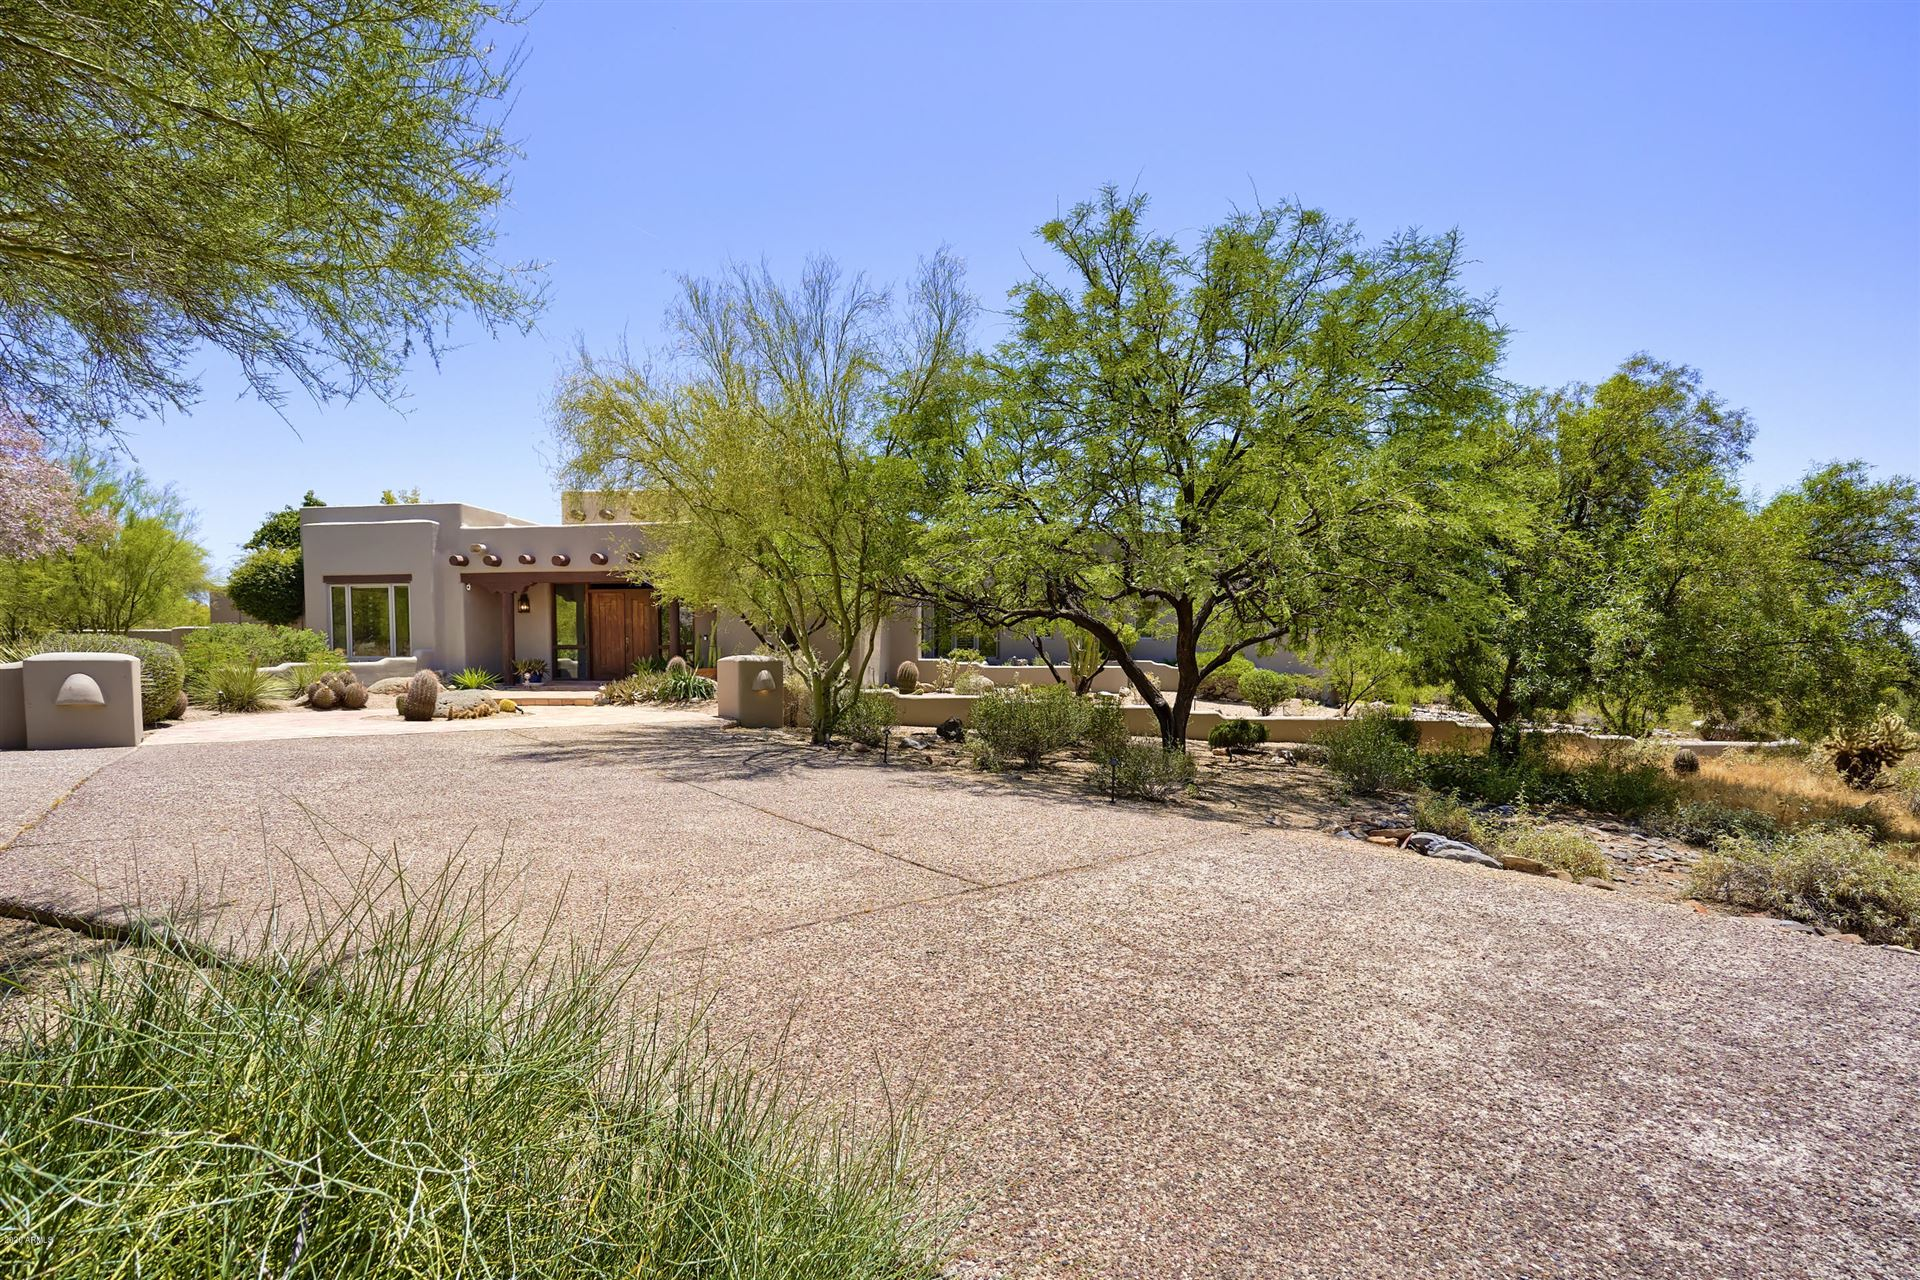 Photo of 34815 N ARROYO Road, Carefree, AZ 85377 (MLS # 6249148)